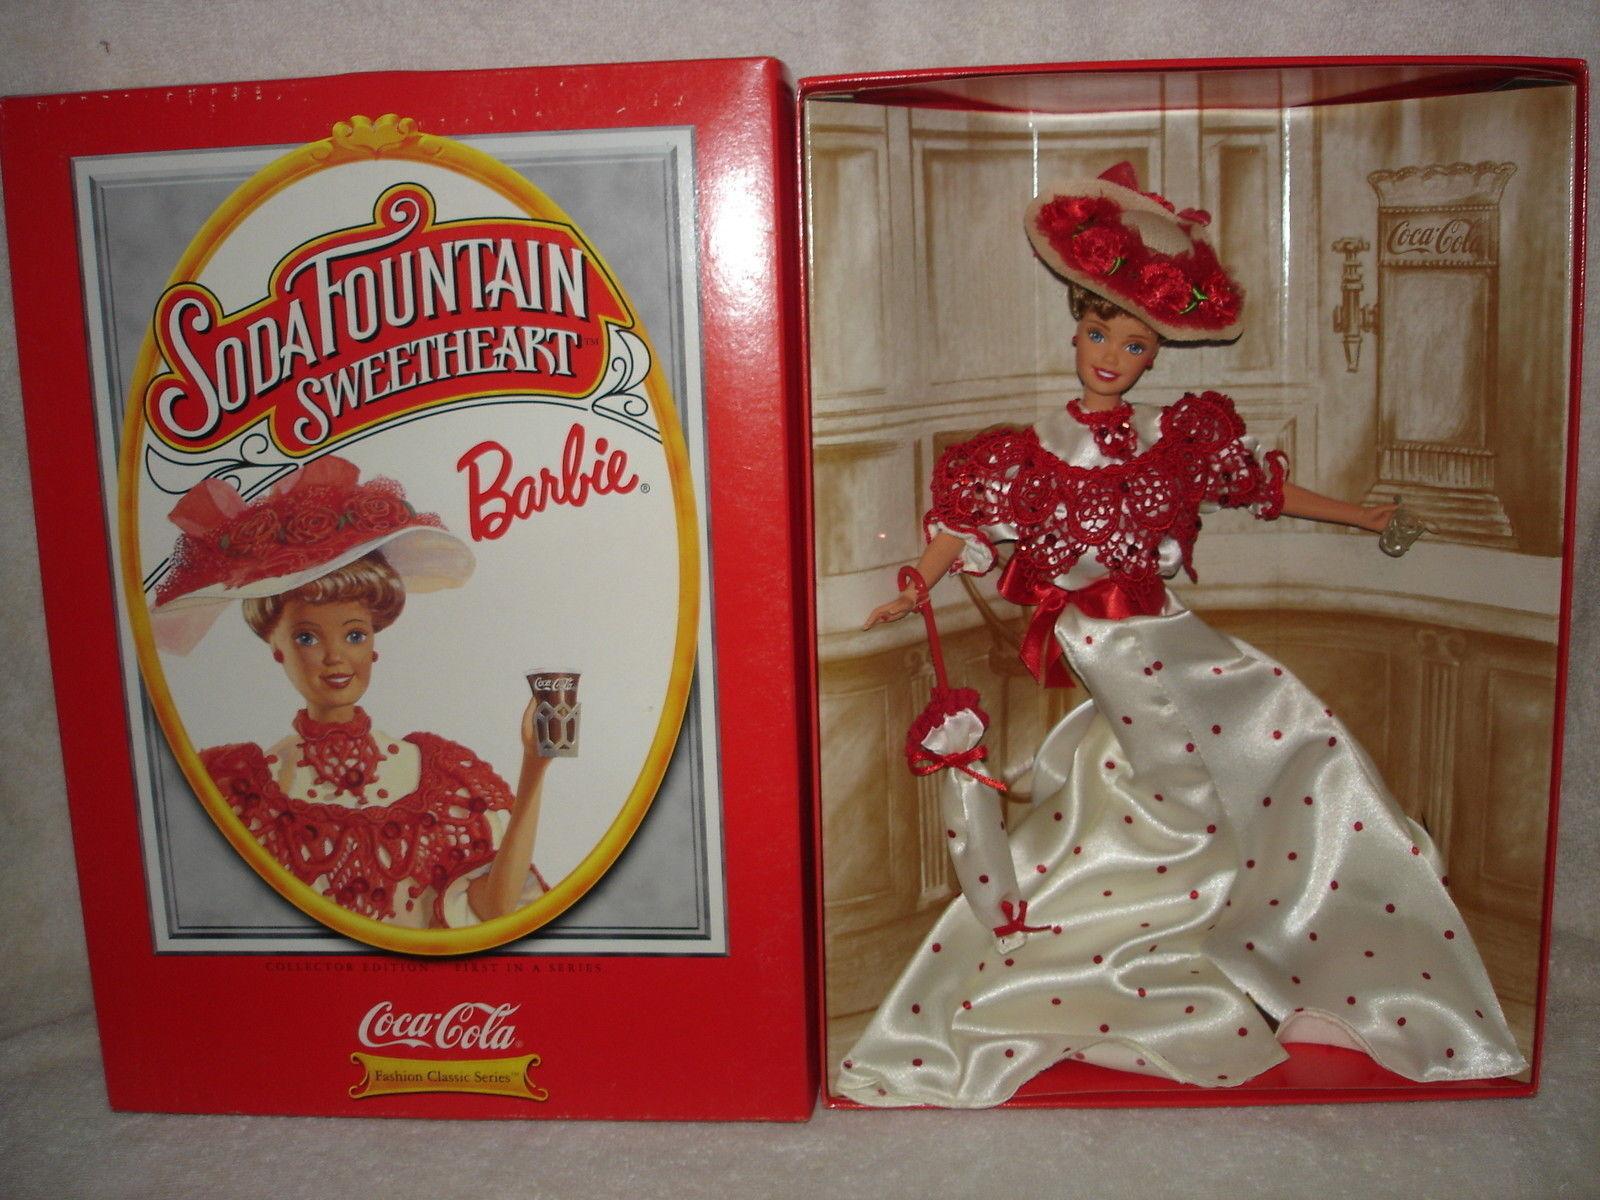 Barbie  coca cola  rar/raras  Soda Fountain Sweetheart  vintage  muñeca  Never